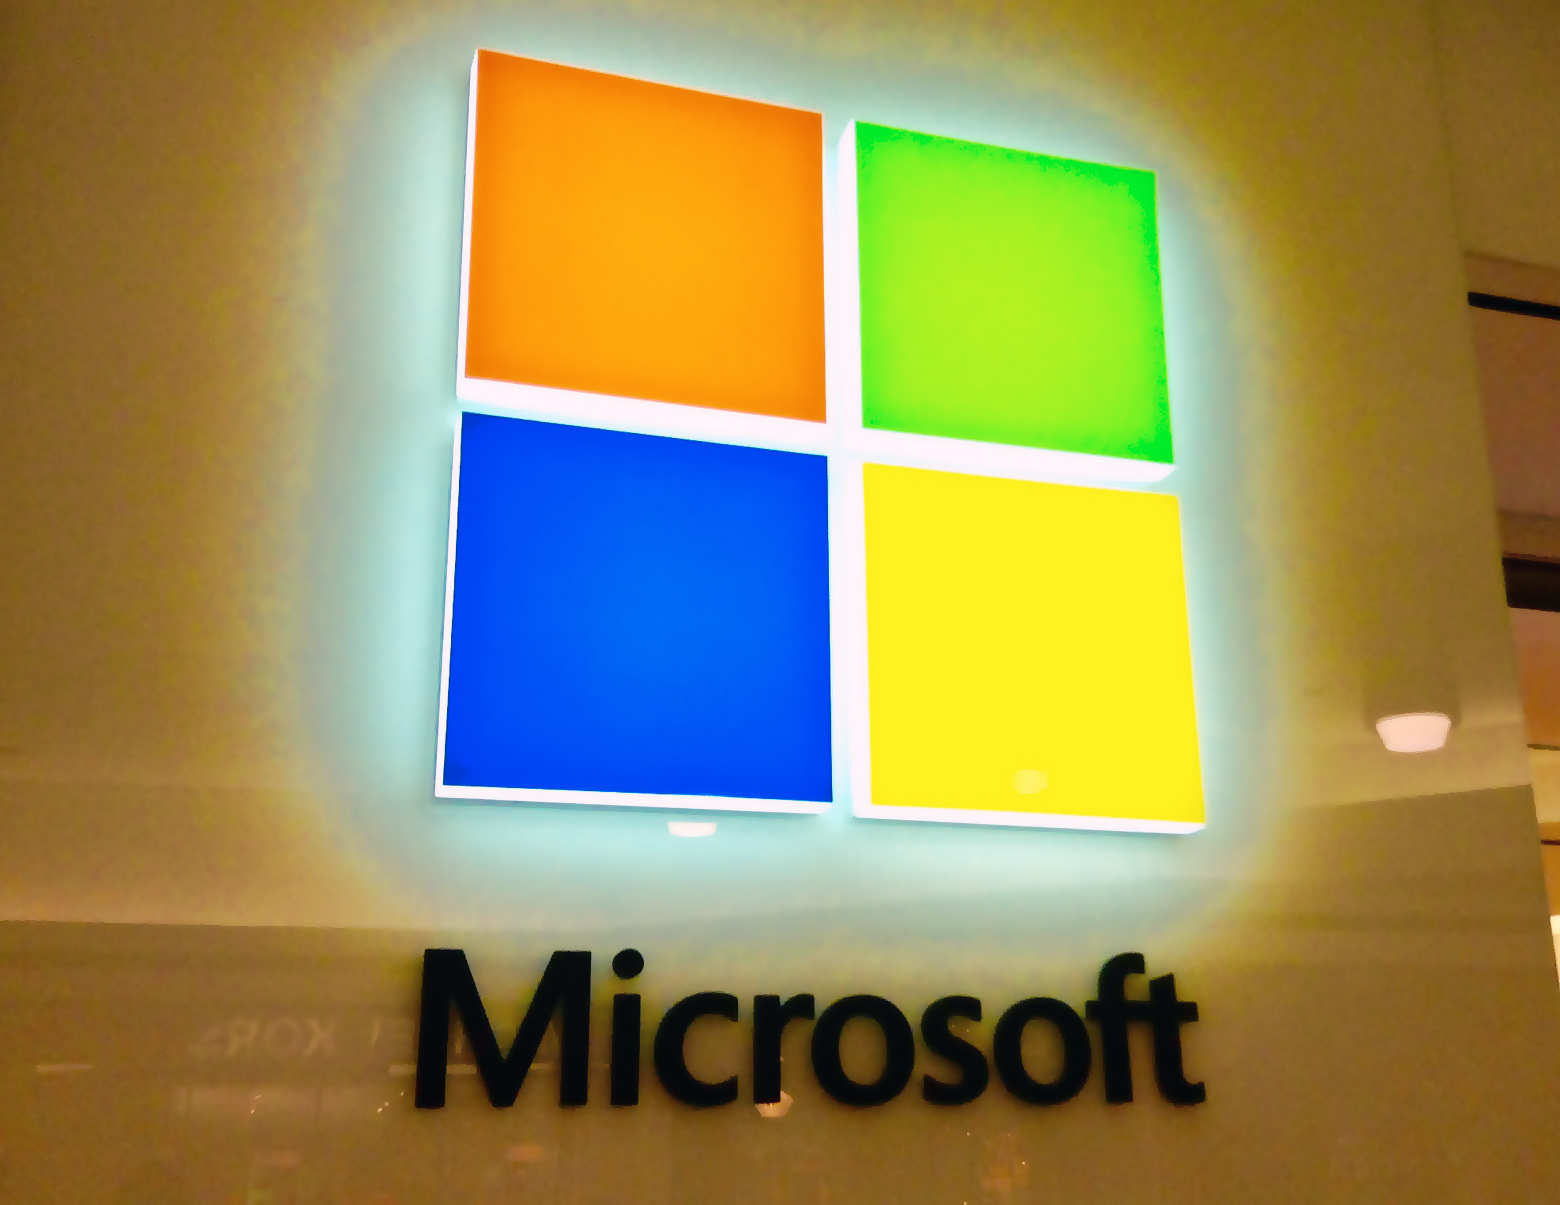 new windows 10 pcs